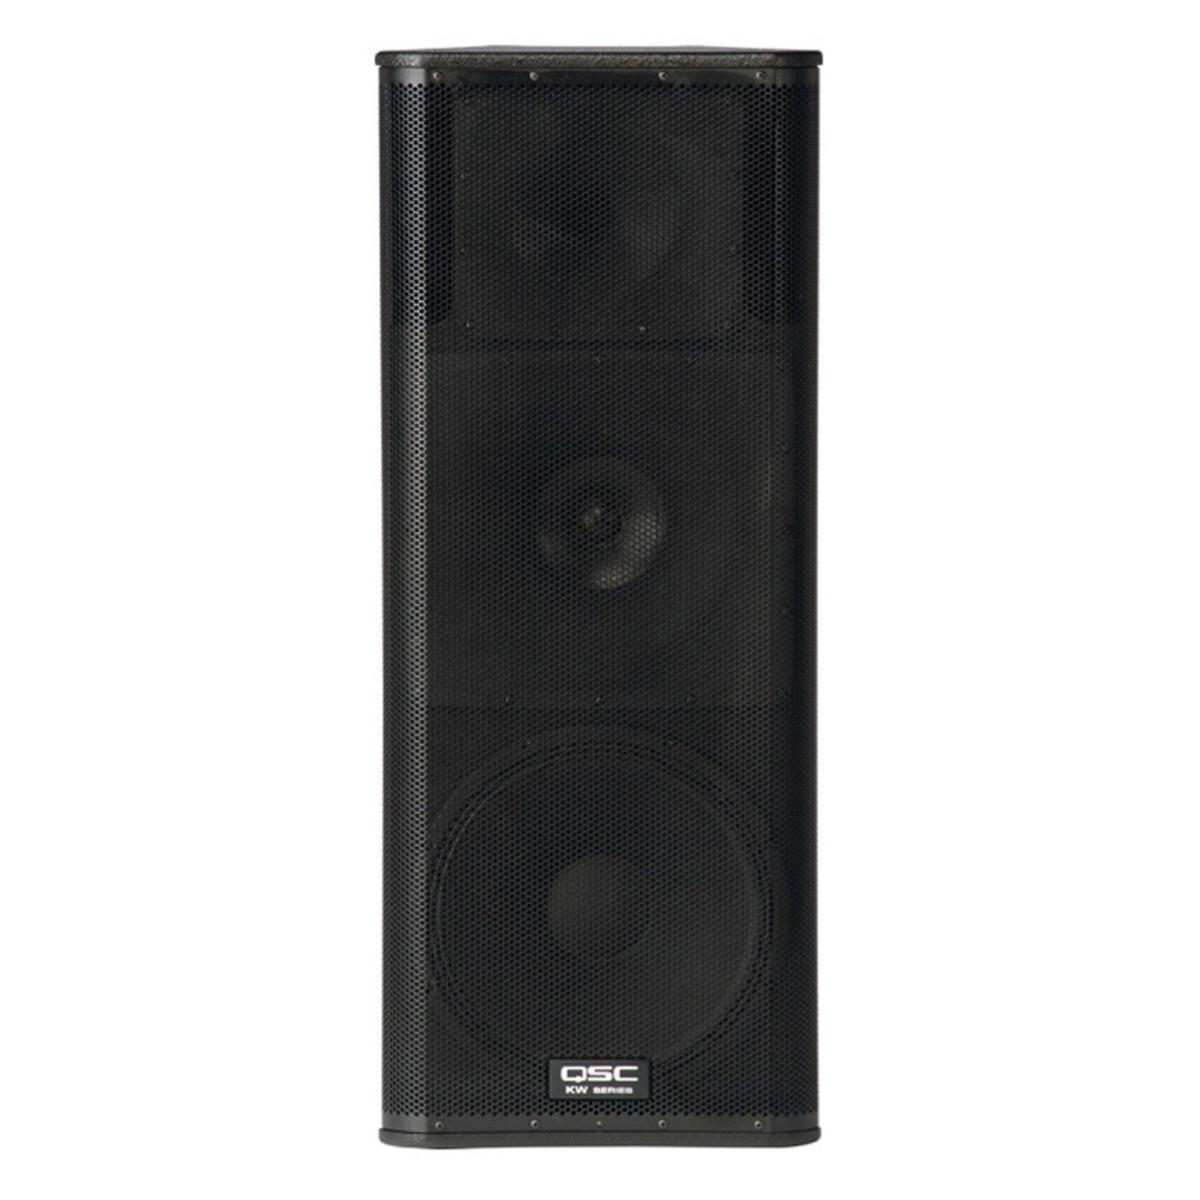 Qsc Kw153 Active 3 Way Pa Speaker 1000 Watt At Gear4music